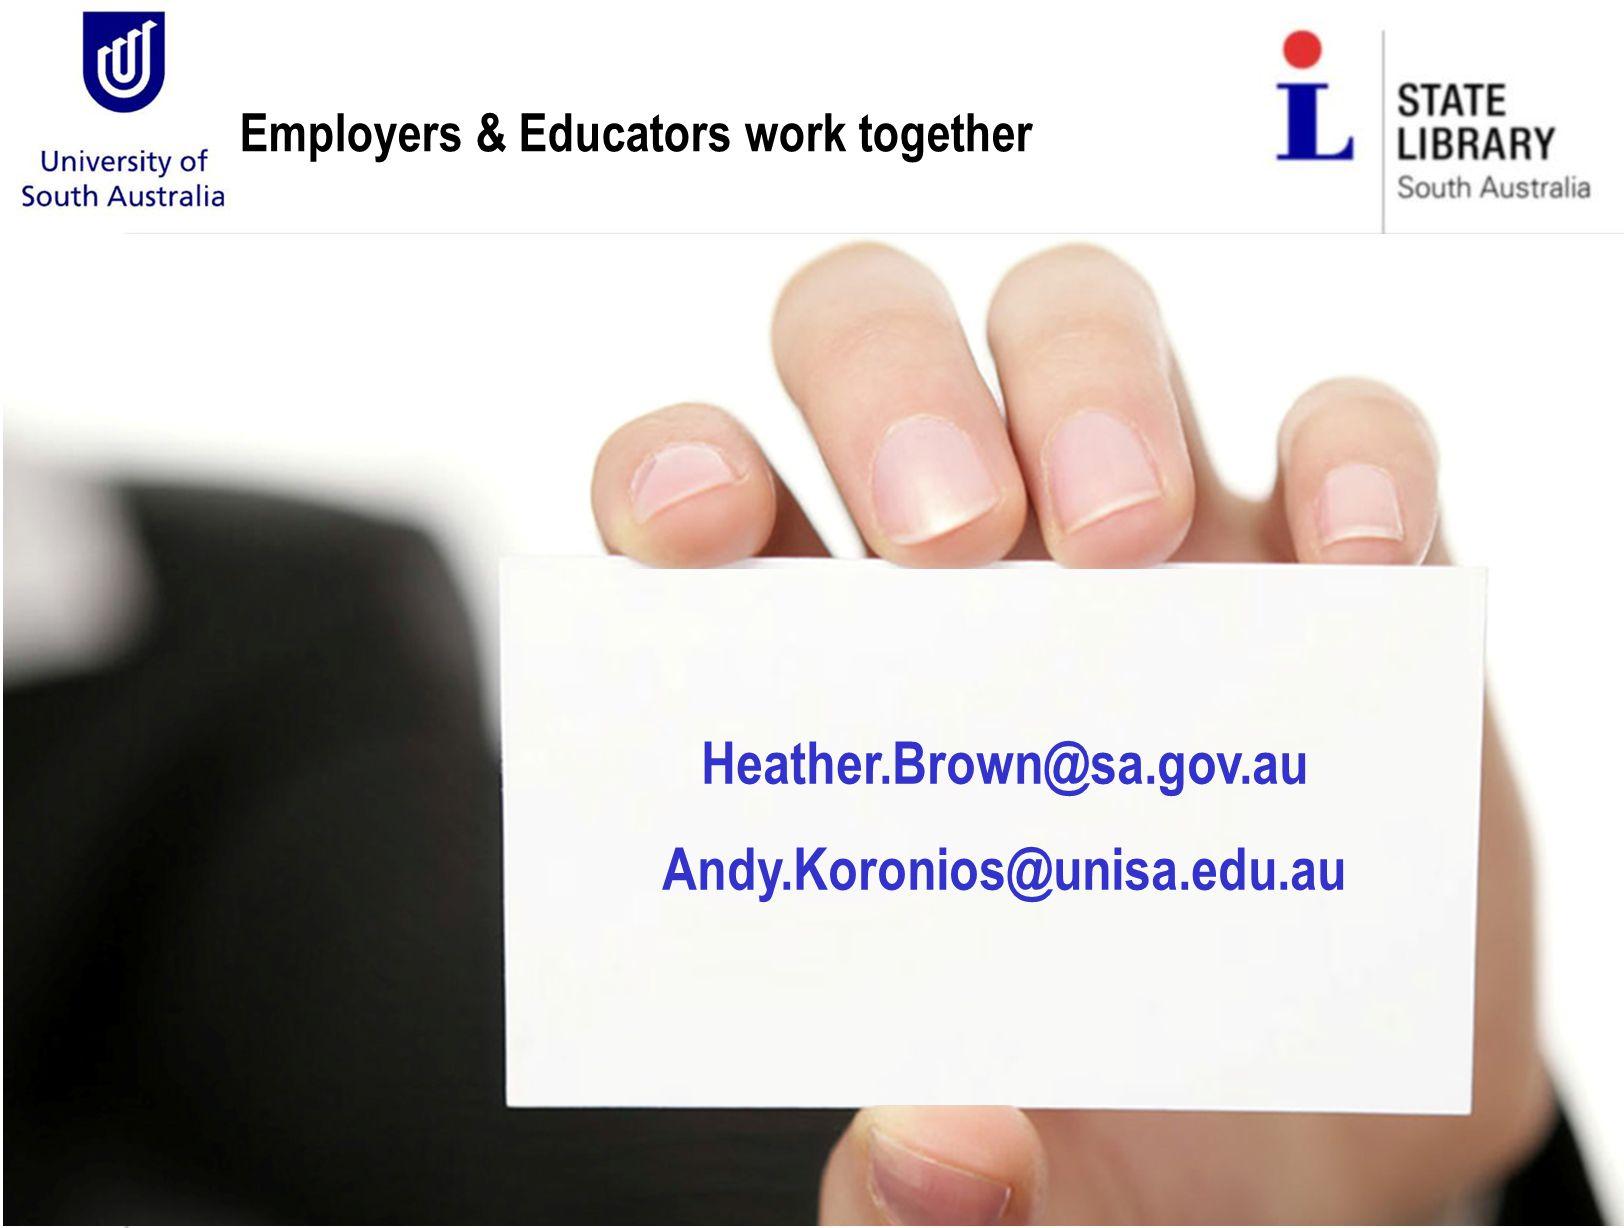 Employers & Educators work together Heather.Brown@sa.gov.au Andy.Koronios@unisa.edu.au